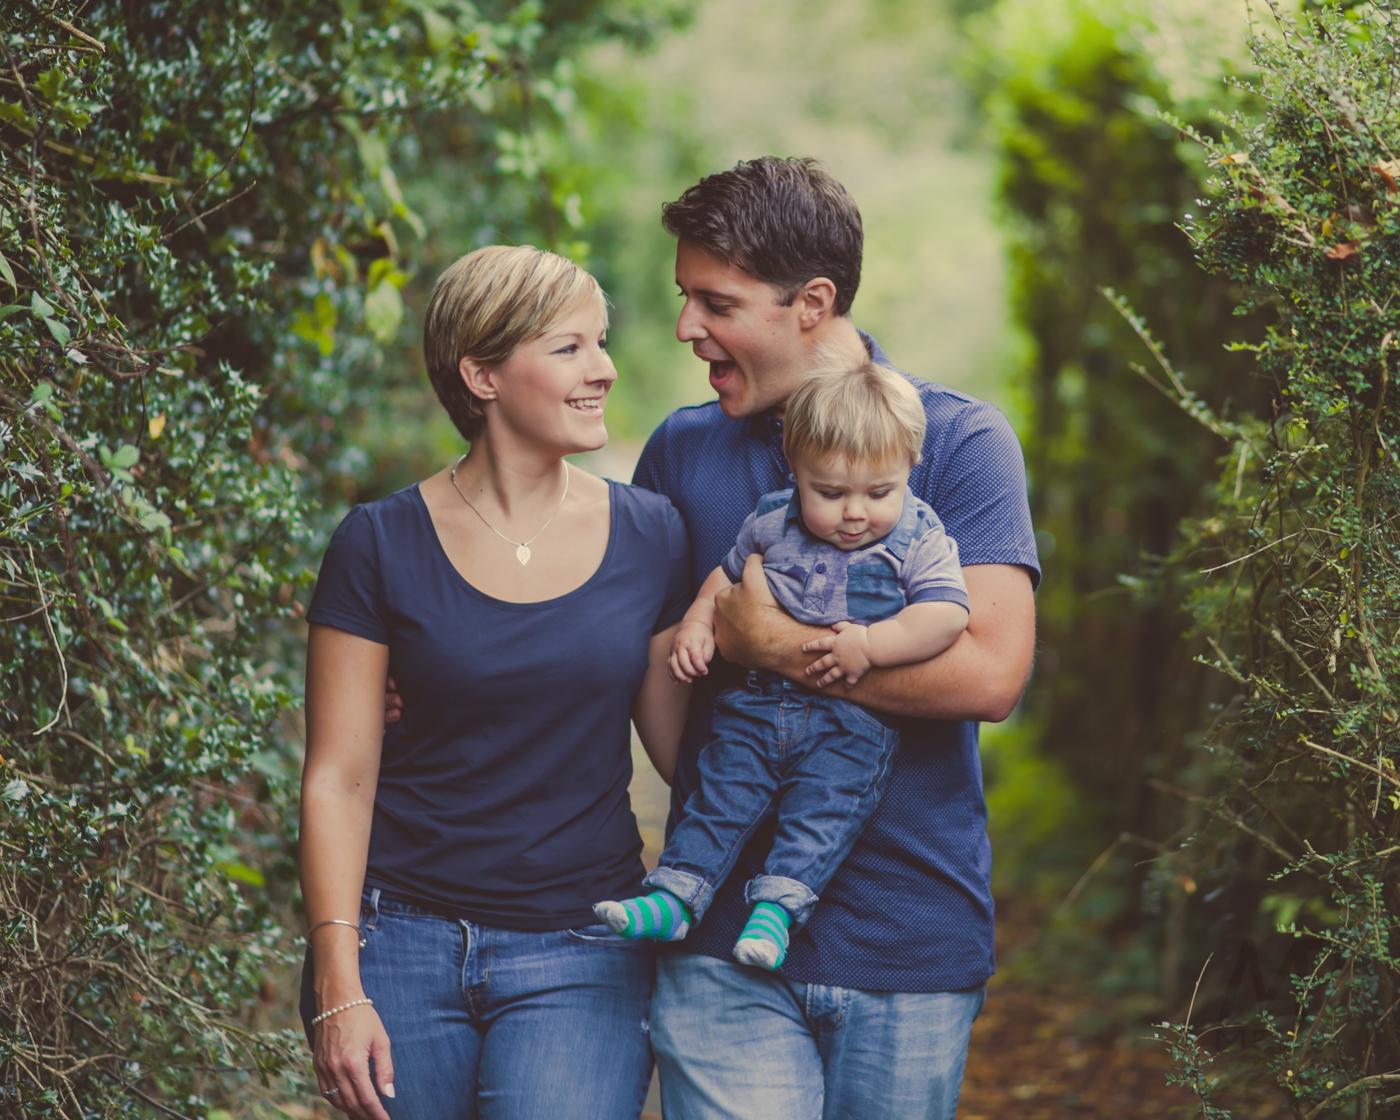 022 - Kelly, Matthew and Hugo Fine Art Family Photography by www.mpmedia.co.uk -118.JPG